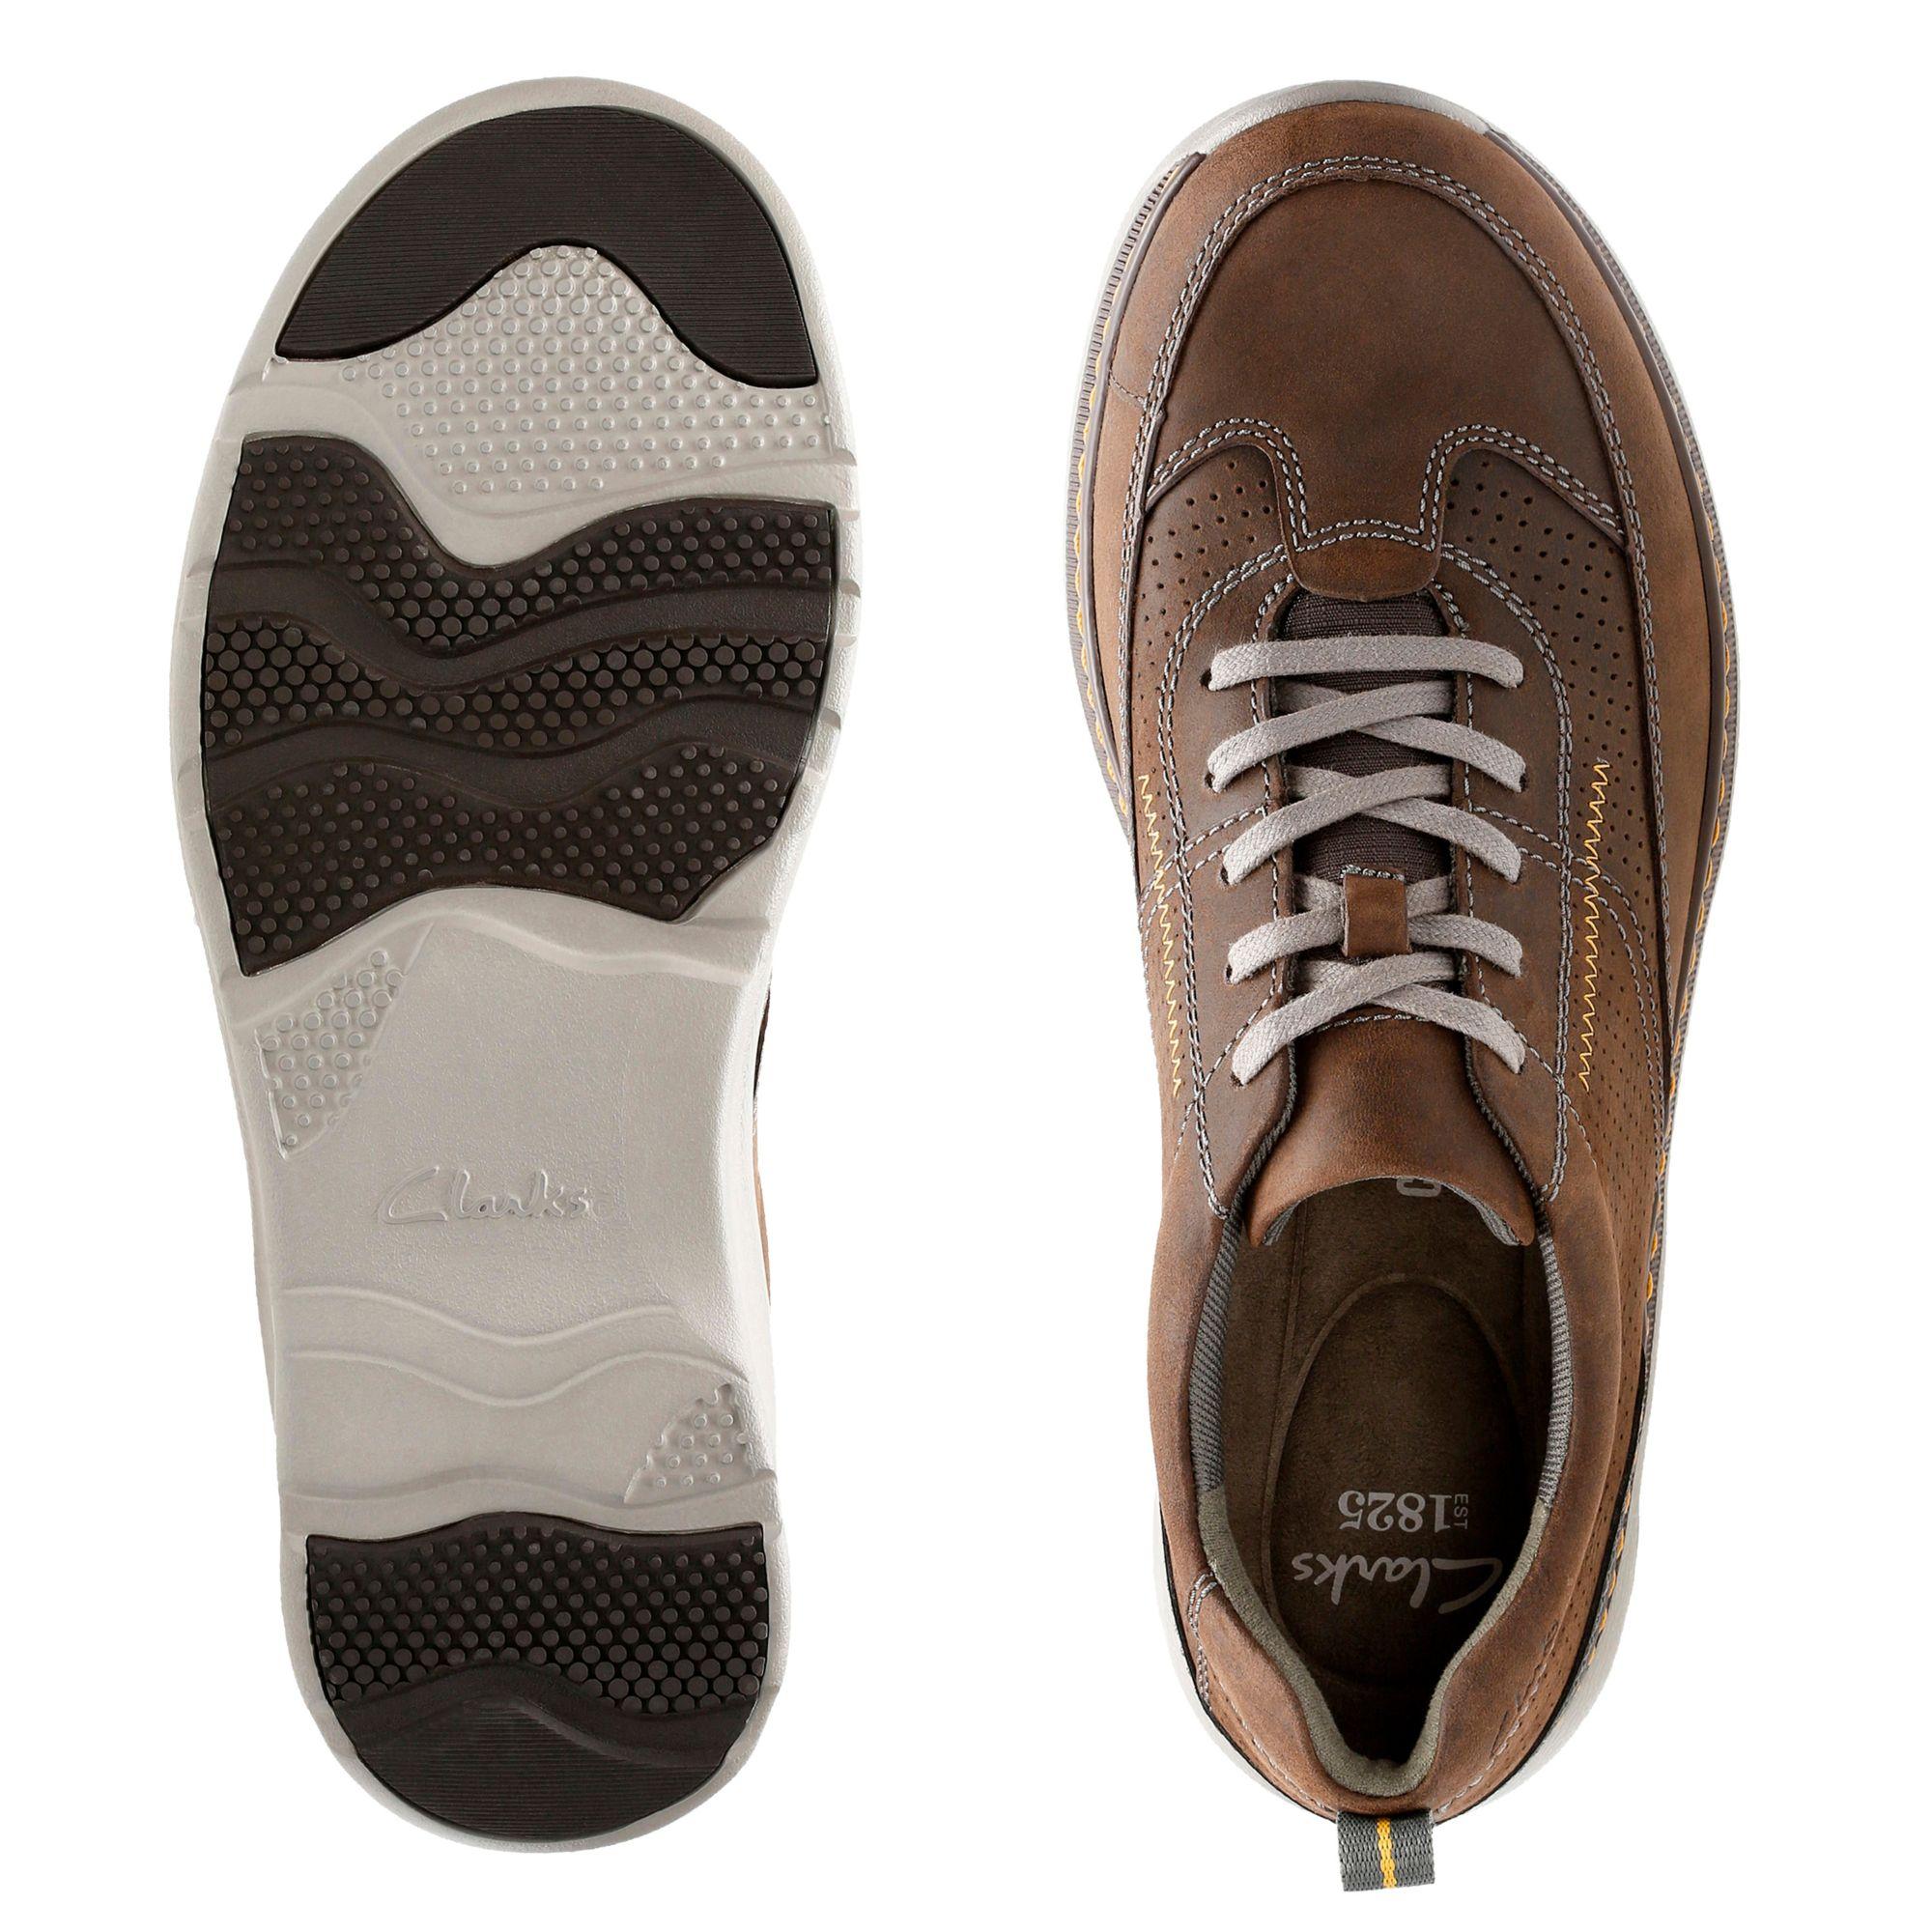 голям размер мъжки обувки clarks charton mix